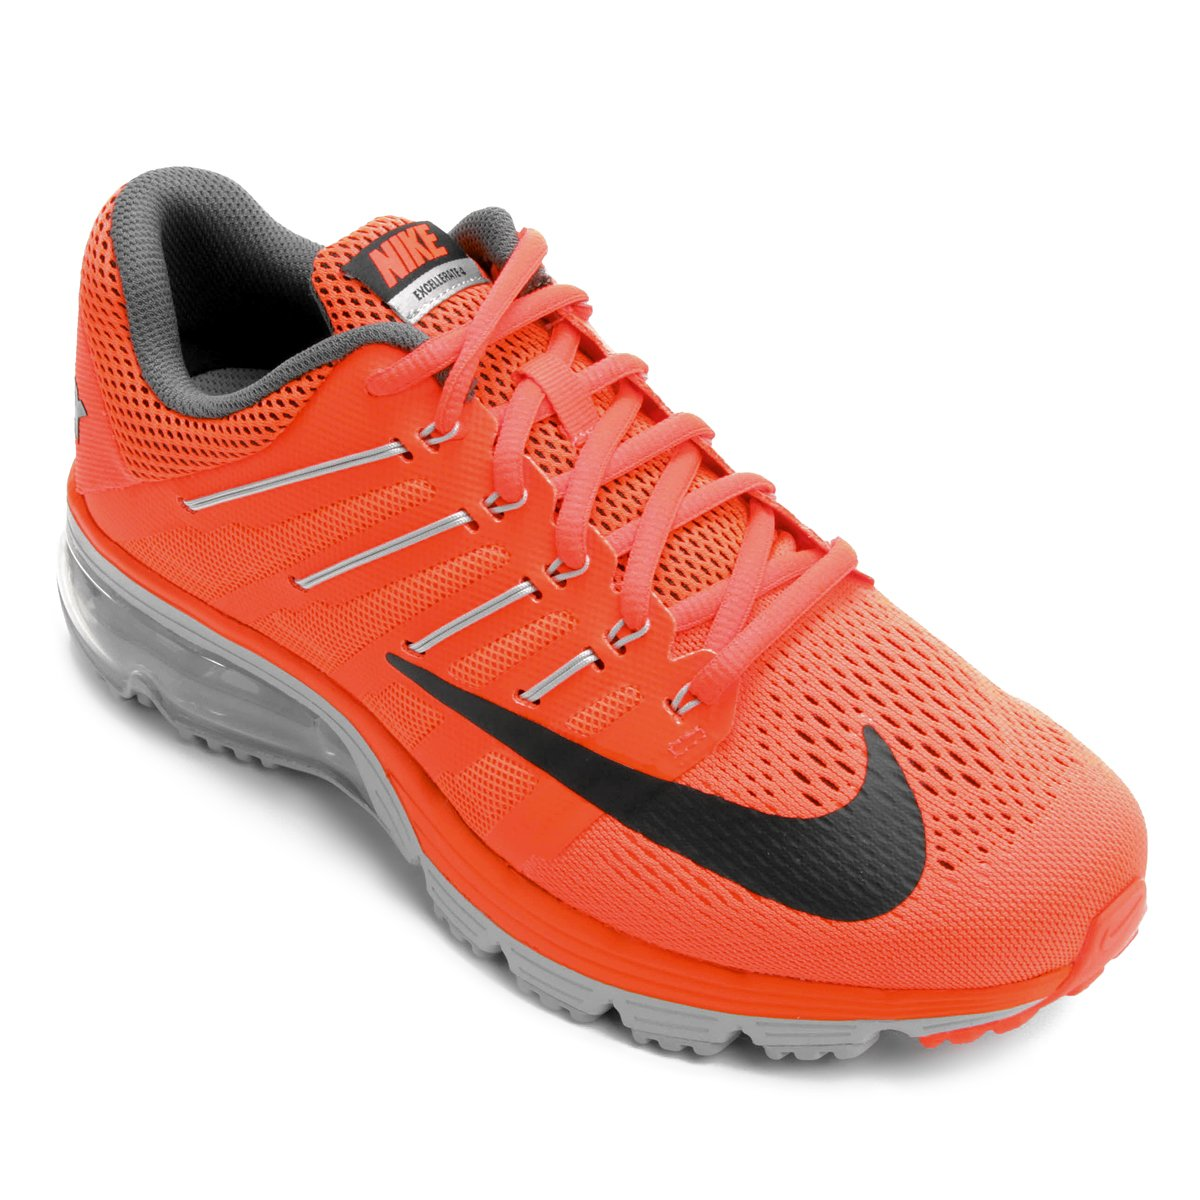 452f46d68af Tênis Nike Air Max Excellerate 4 Masculino - Compre Agora